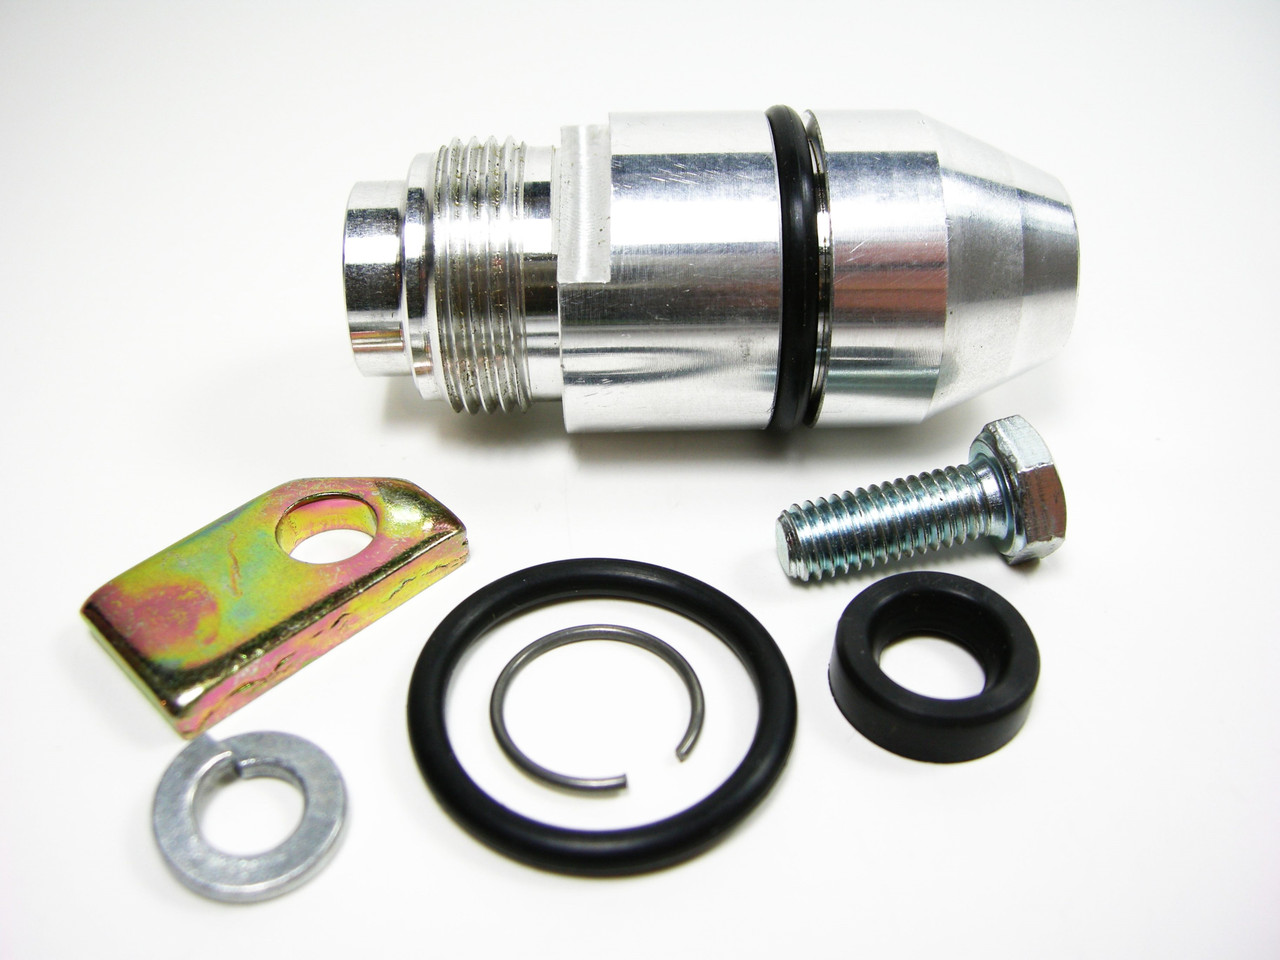 2004R Speedometer Speedo Housing for 200-4R TH125 440-T4 325-4L